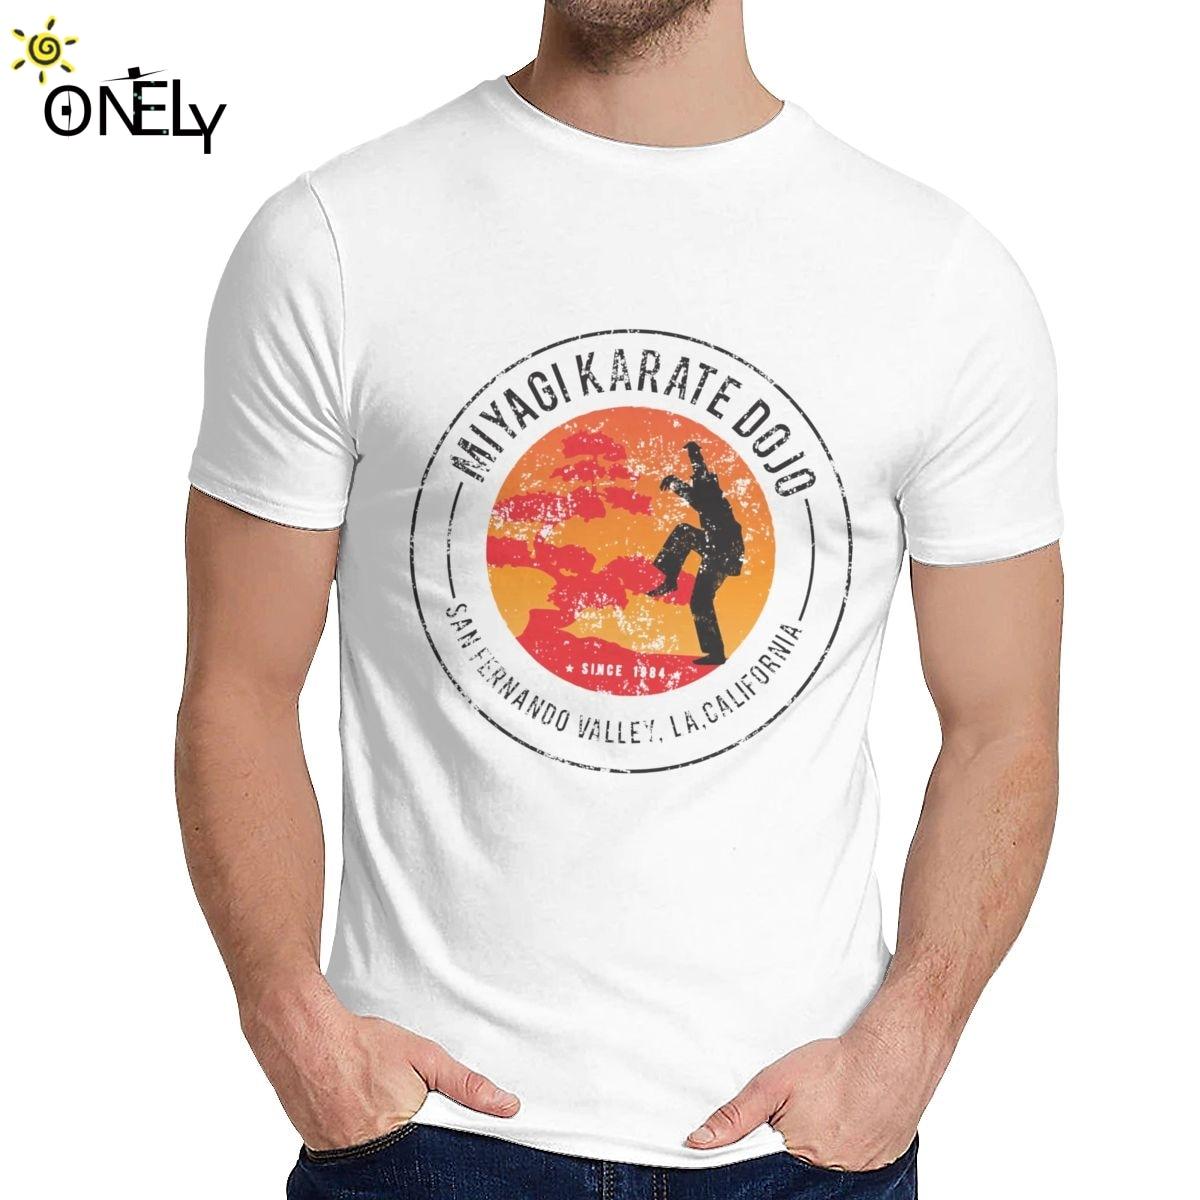 Camiseta de Dojo Miyagi con cuello redondo 2019 de algodón 100% para hombre de talla grande